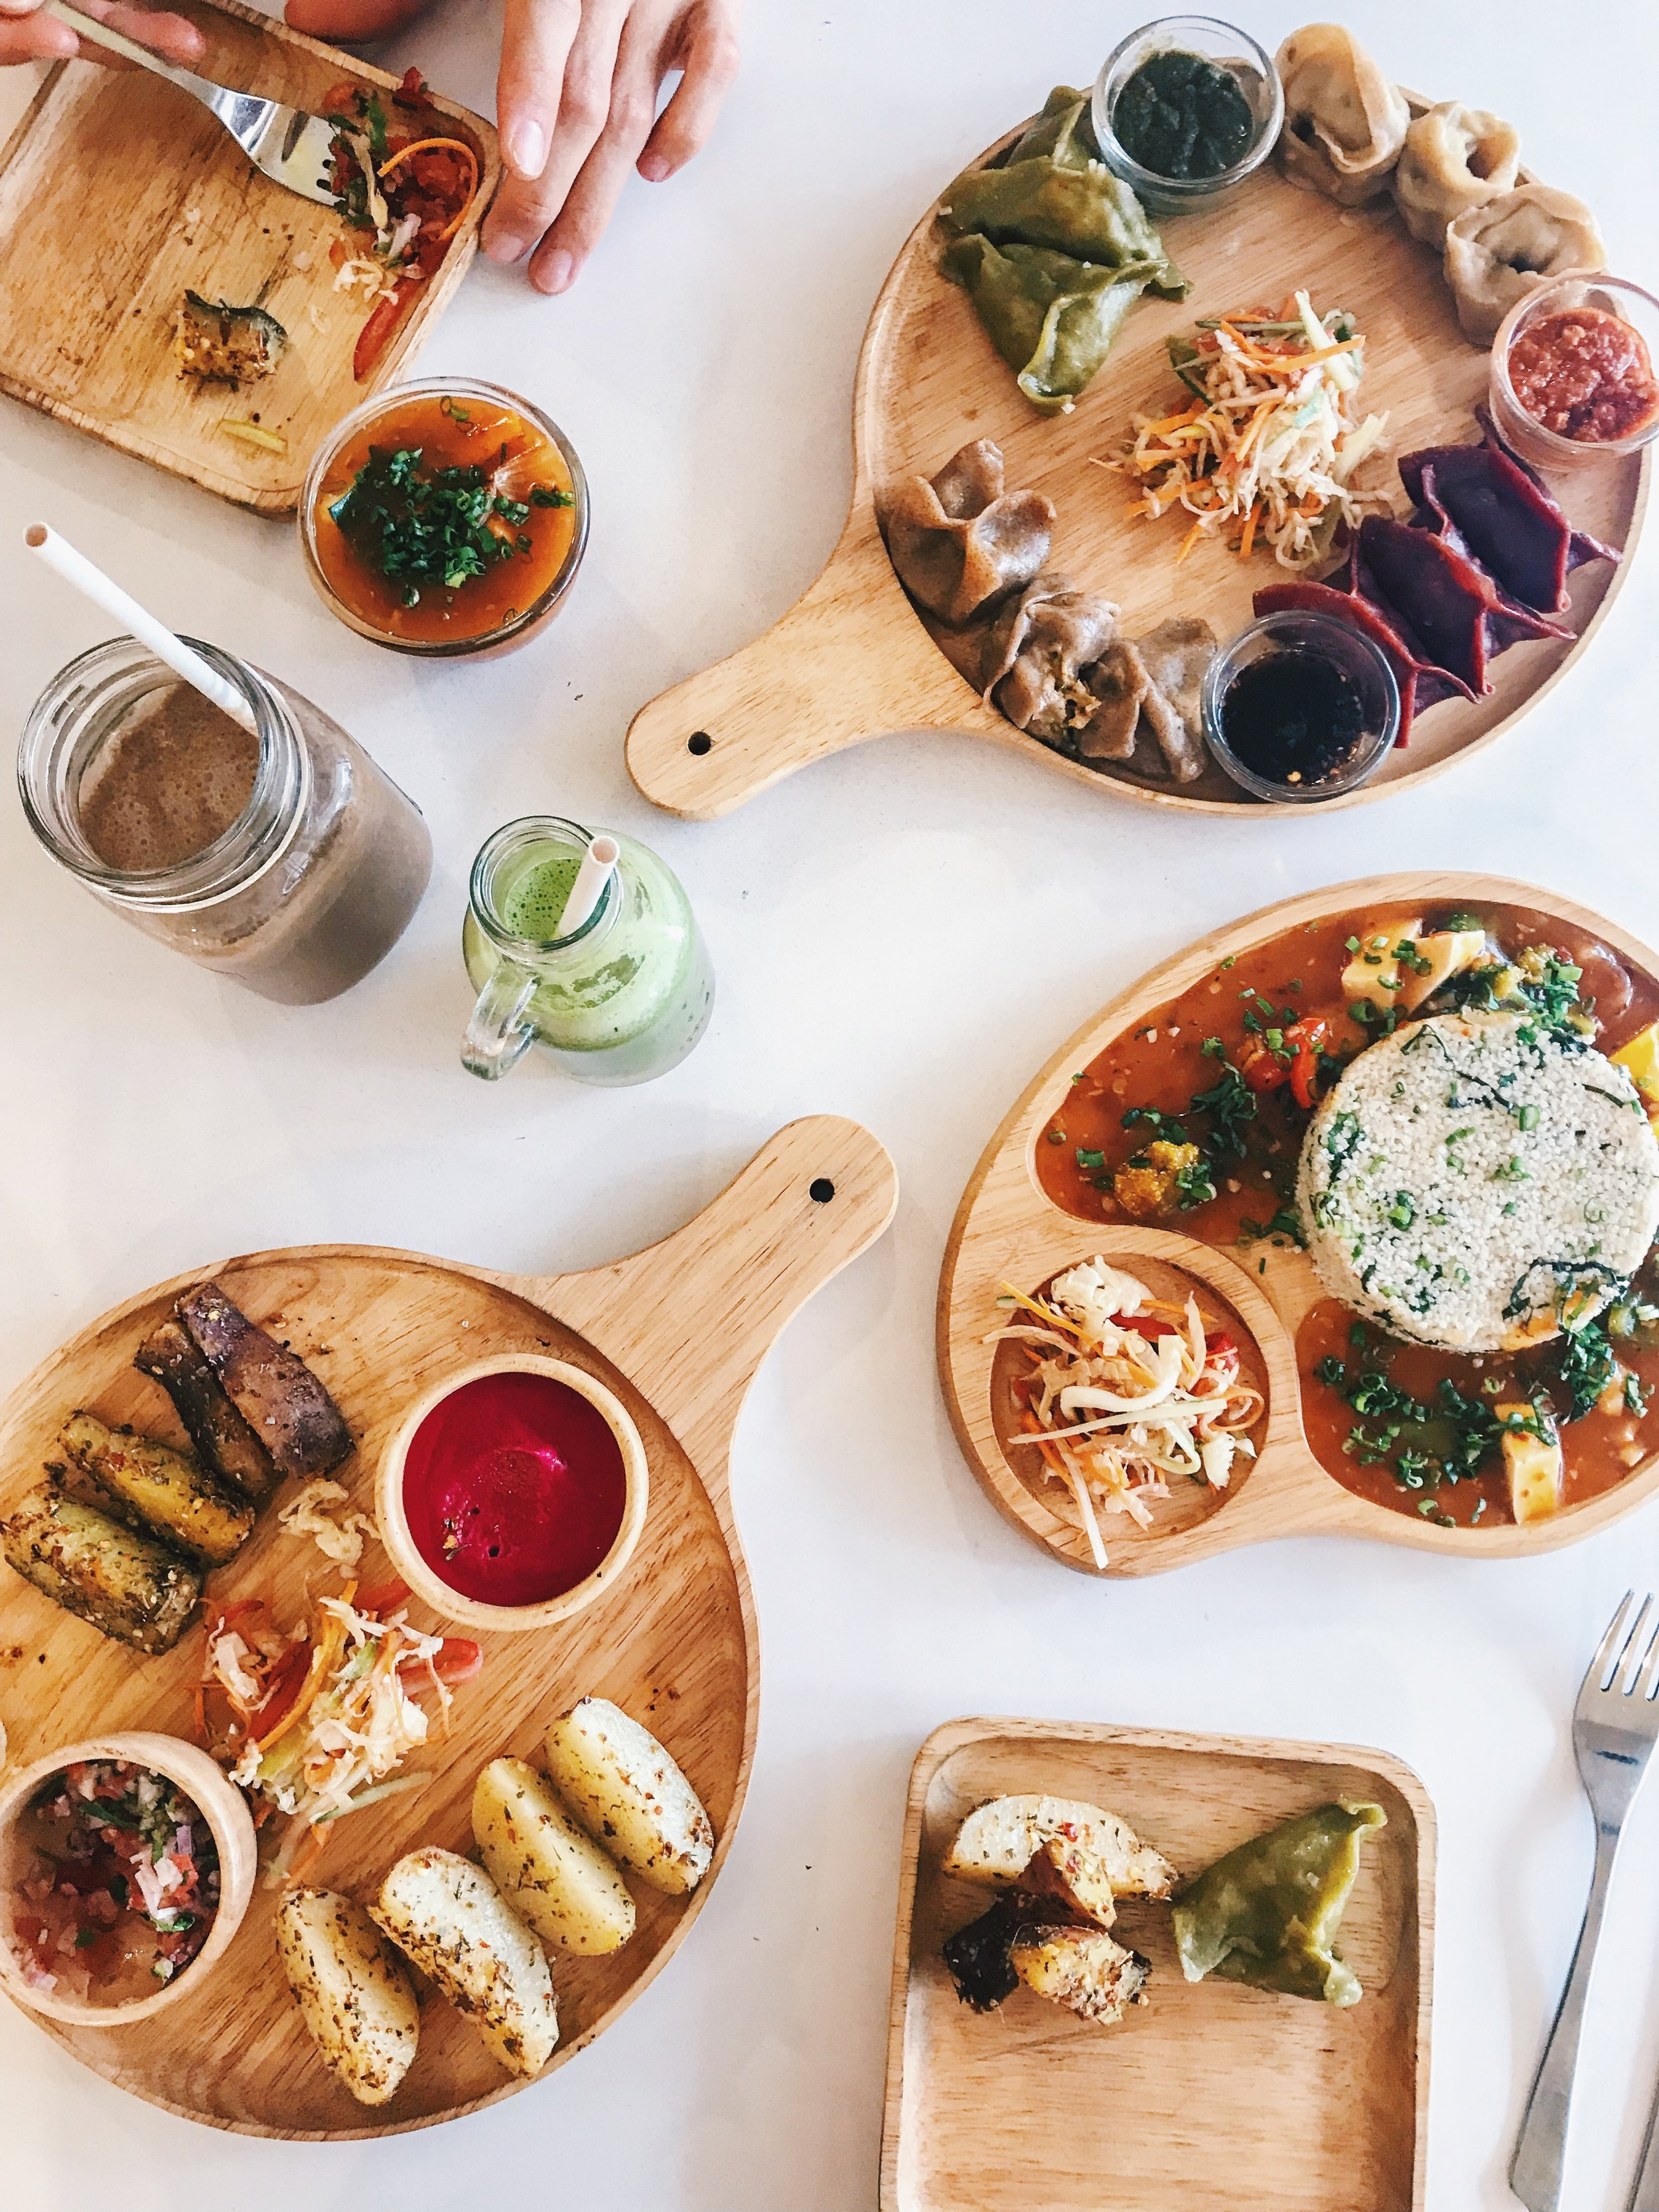 Healthy eats at Enerjuvate, Bengalore